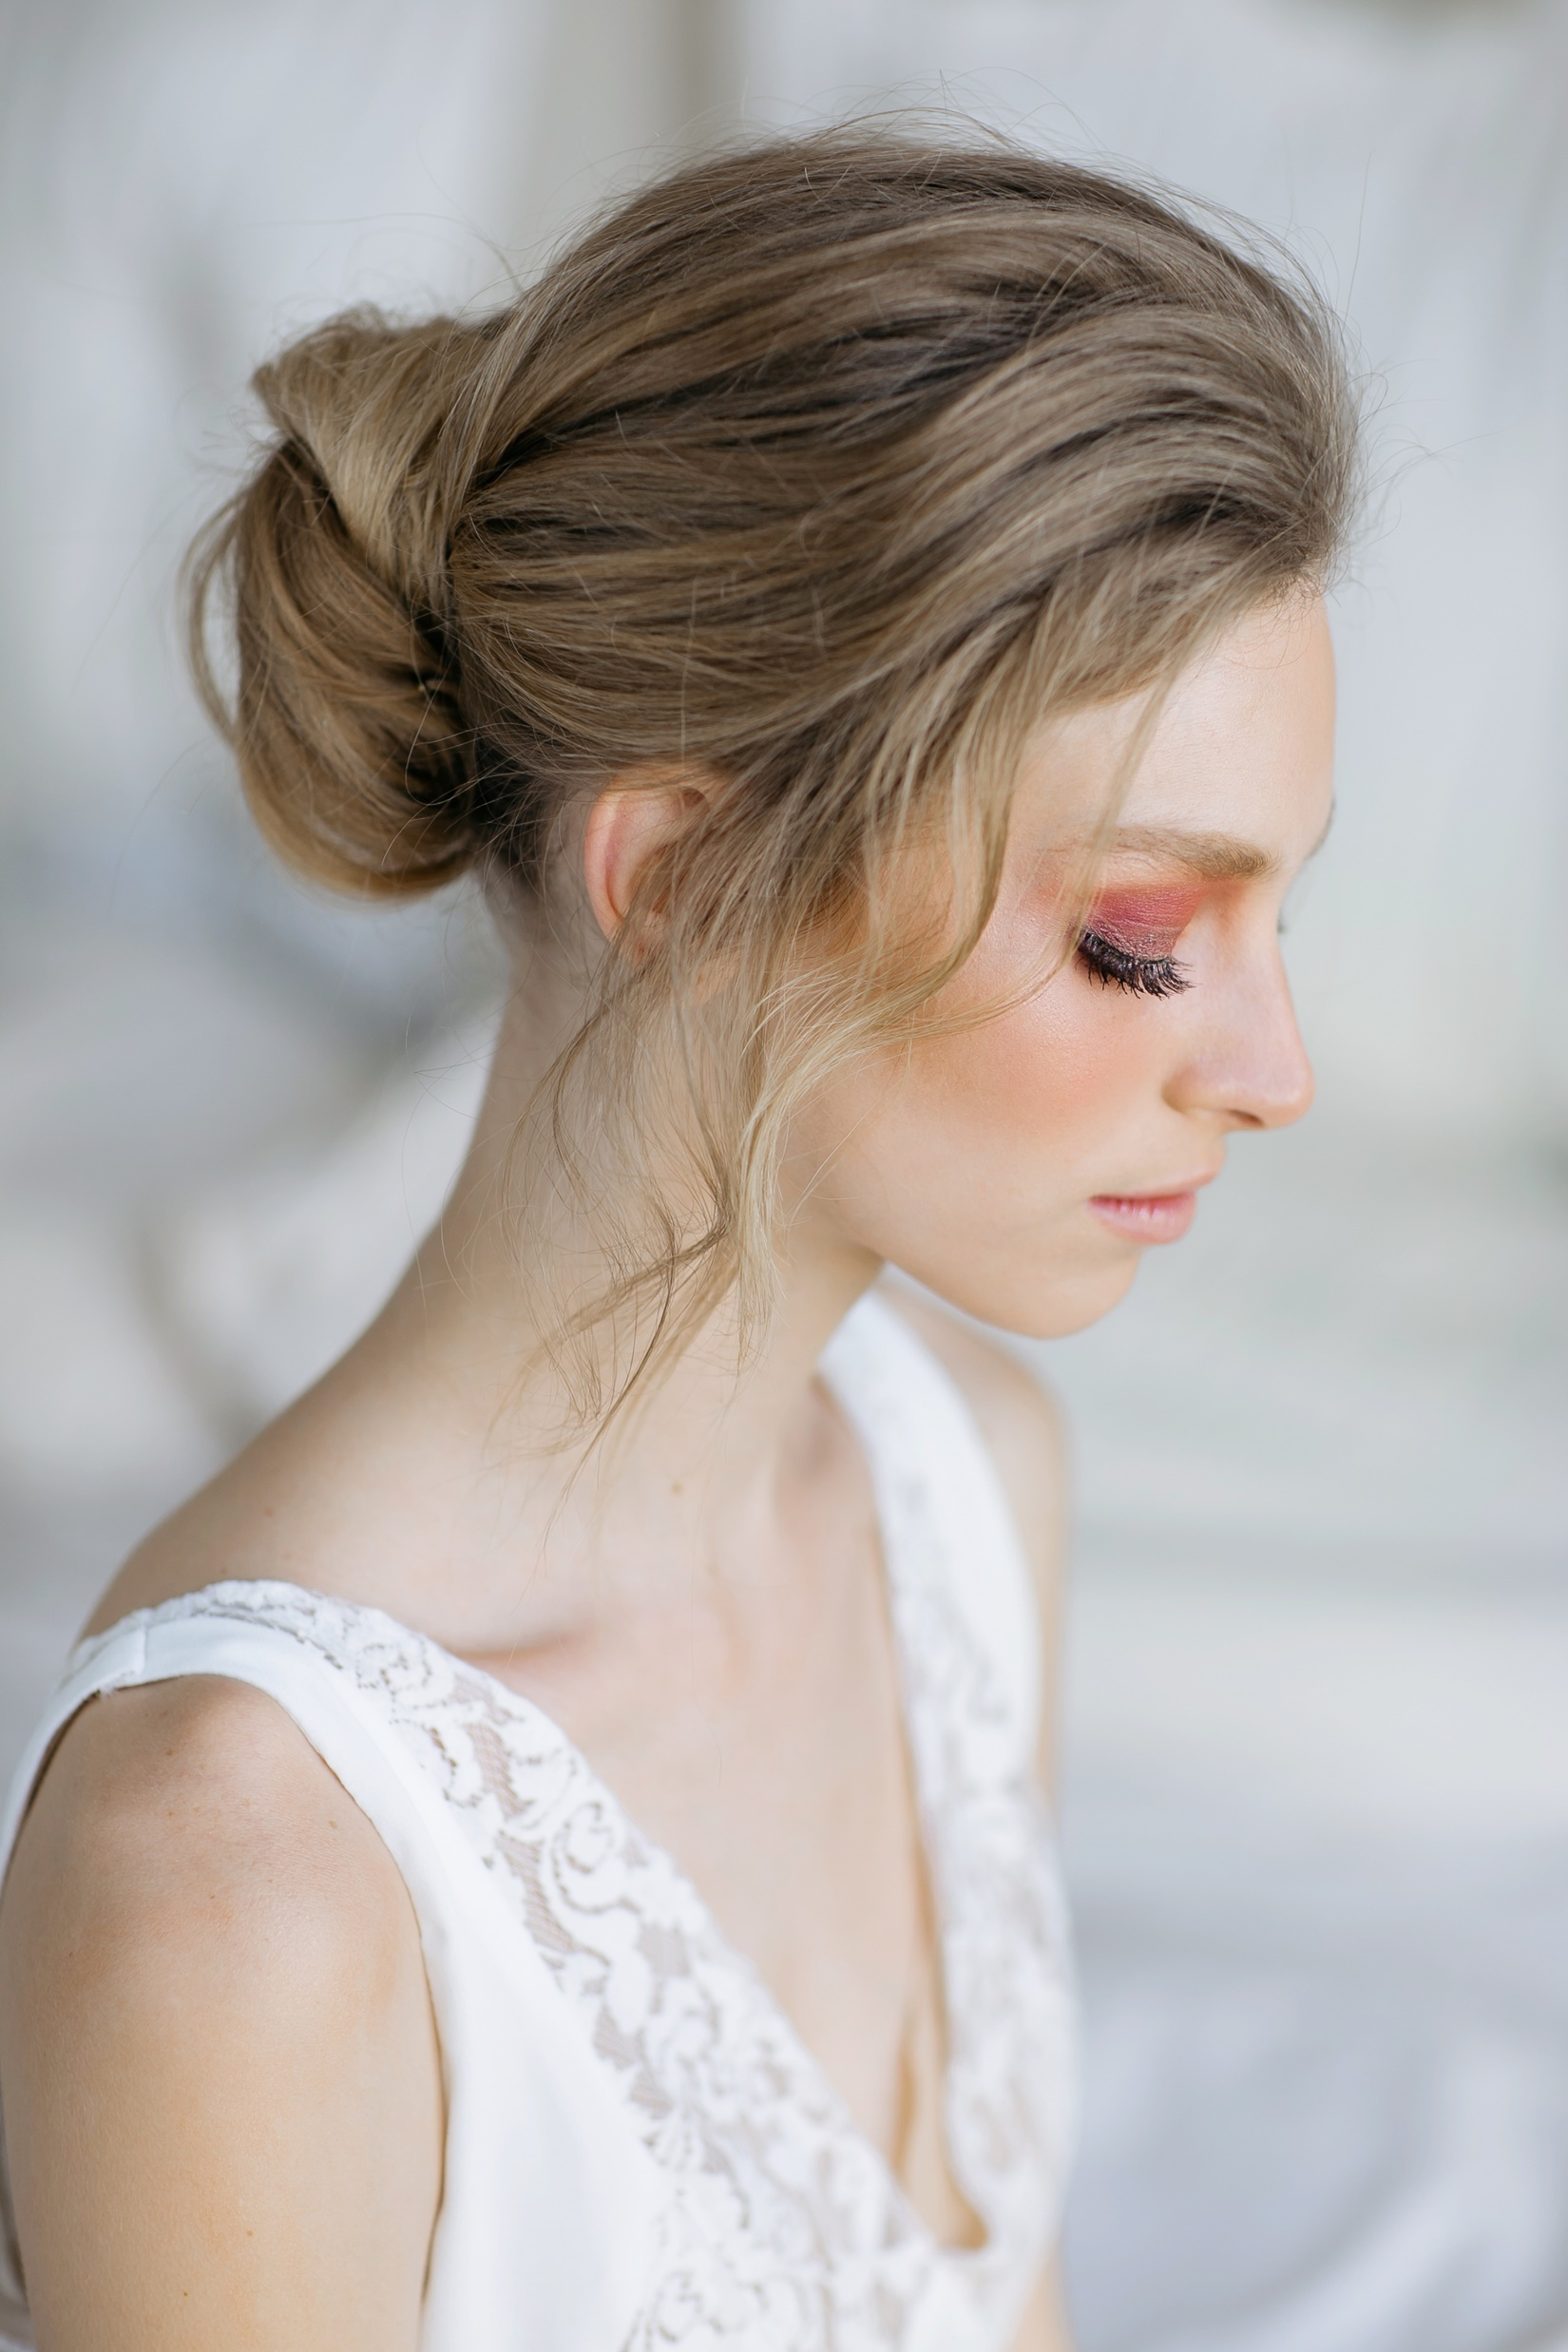 peach perfect: לוקים מרעננים ליום החתונה